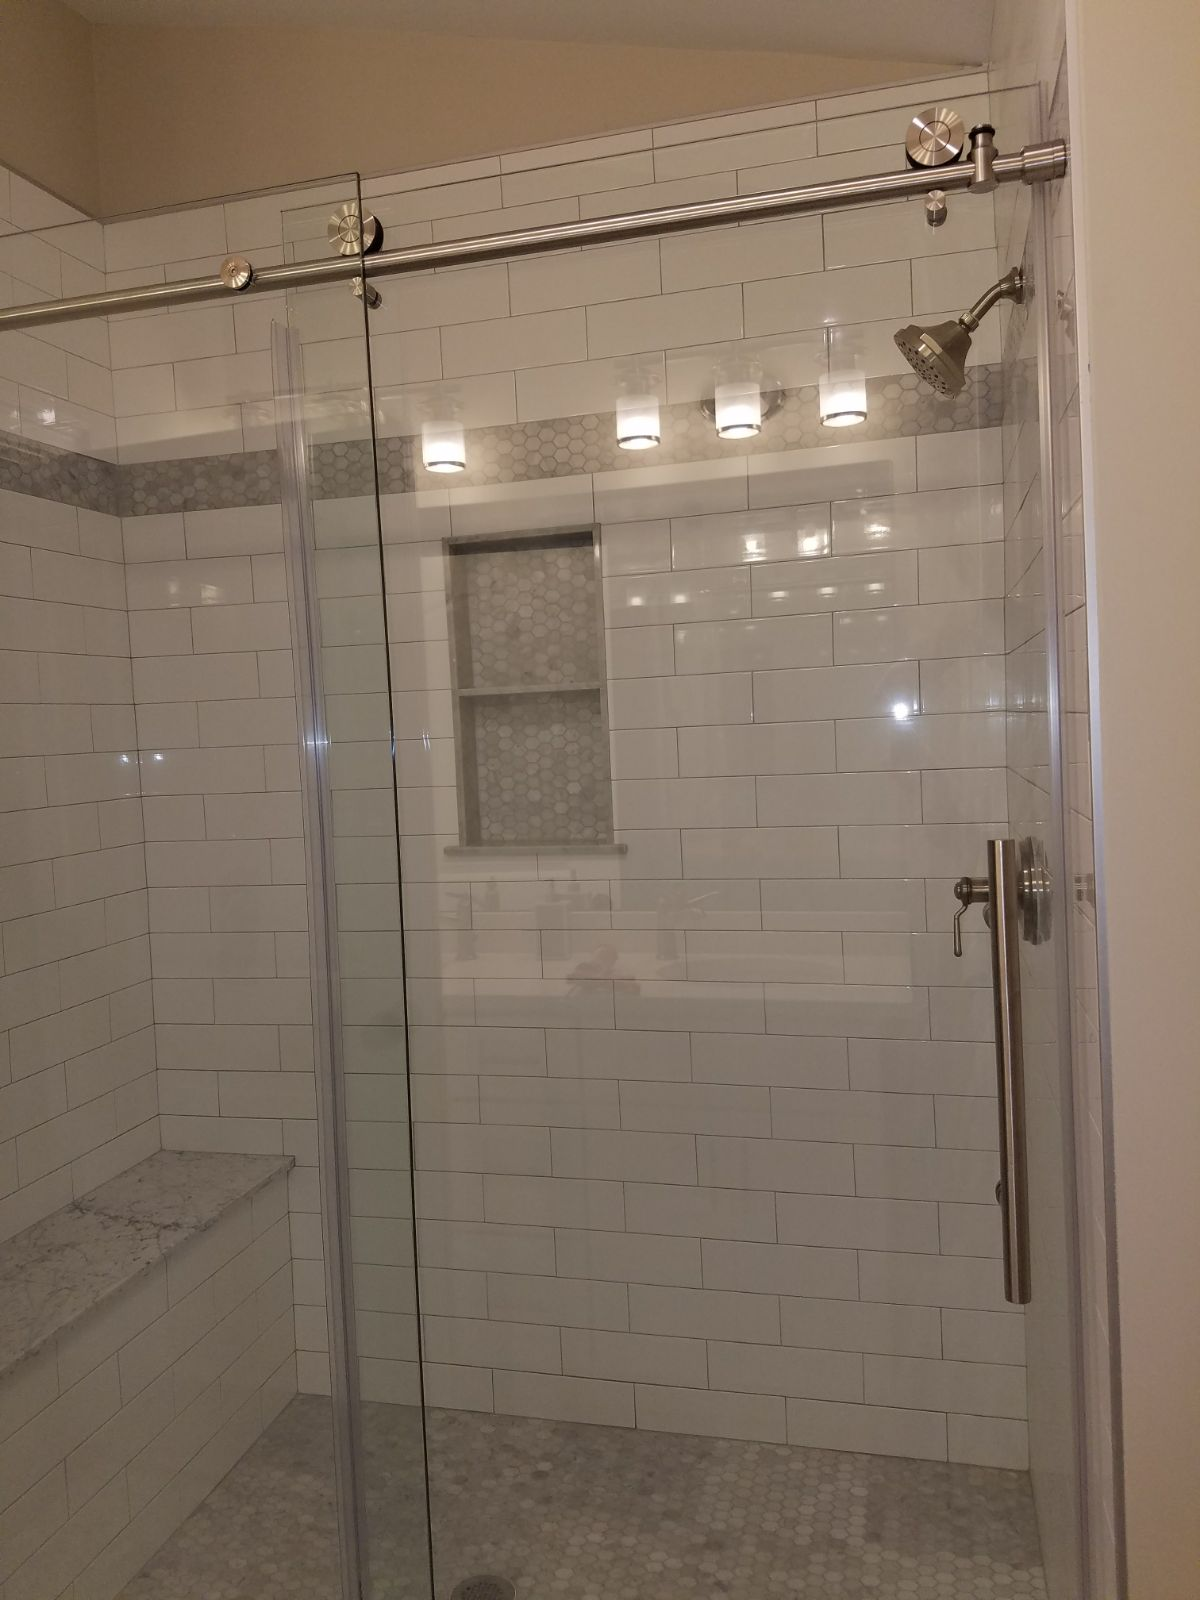 Bathroom 8.36.09 PM.jpeg